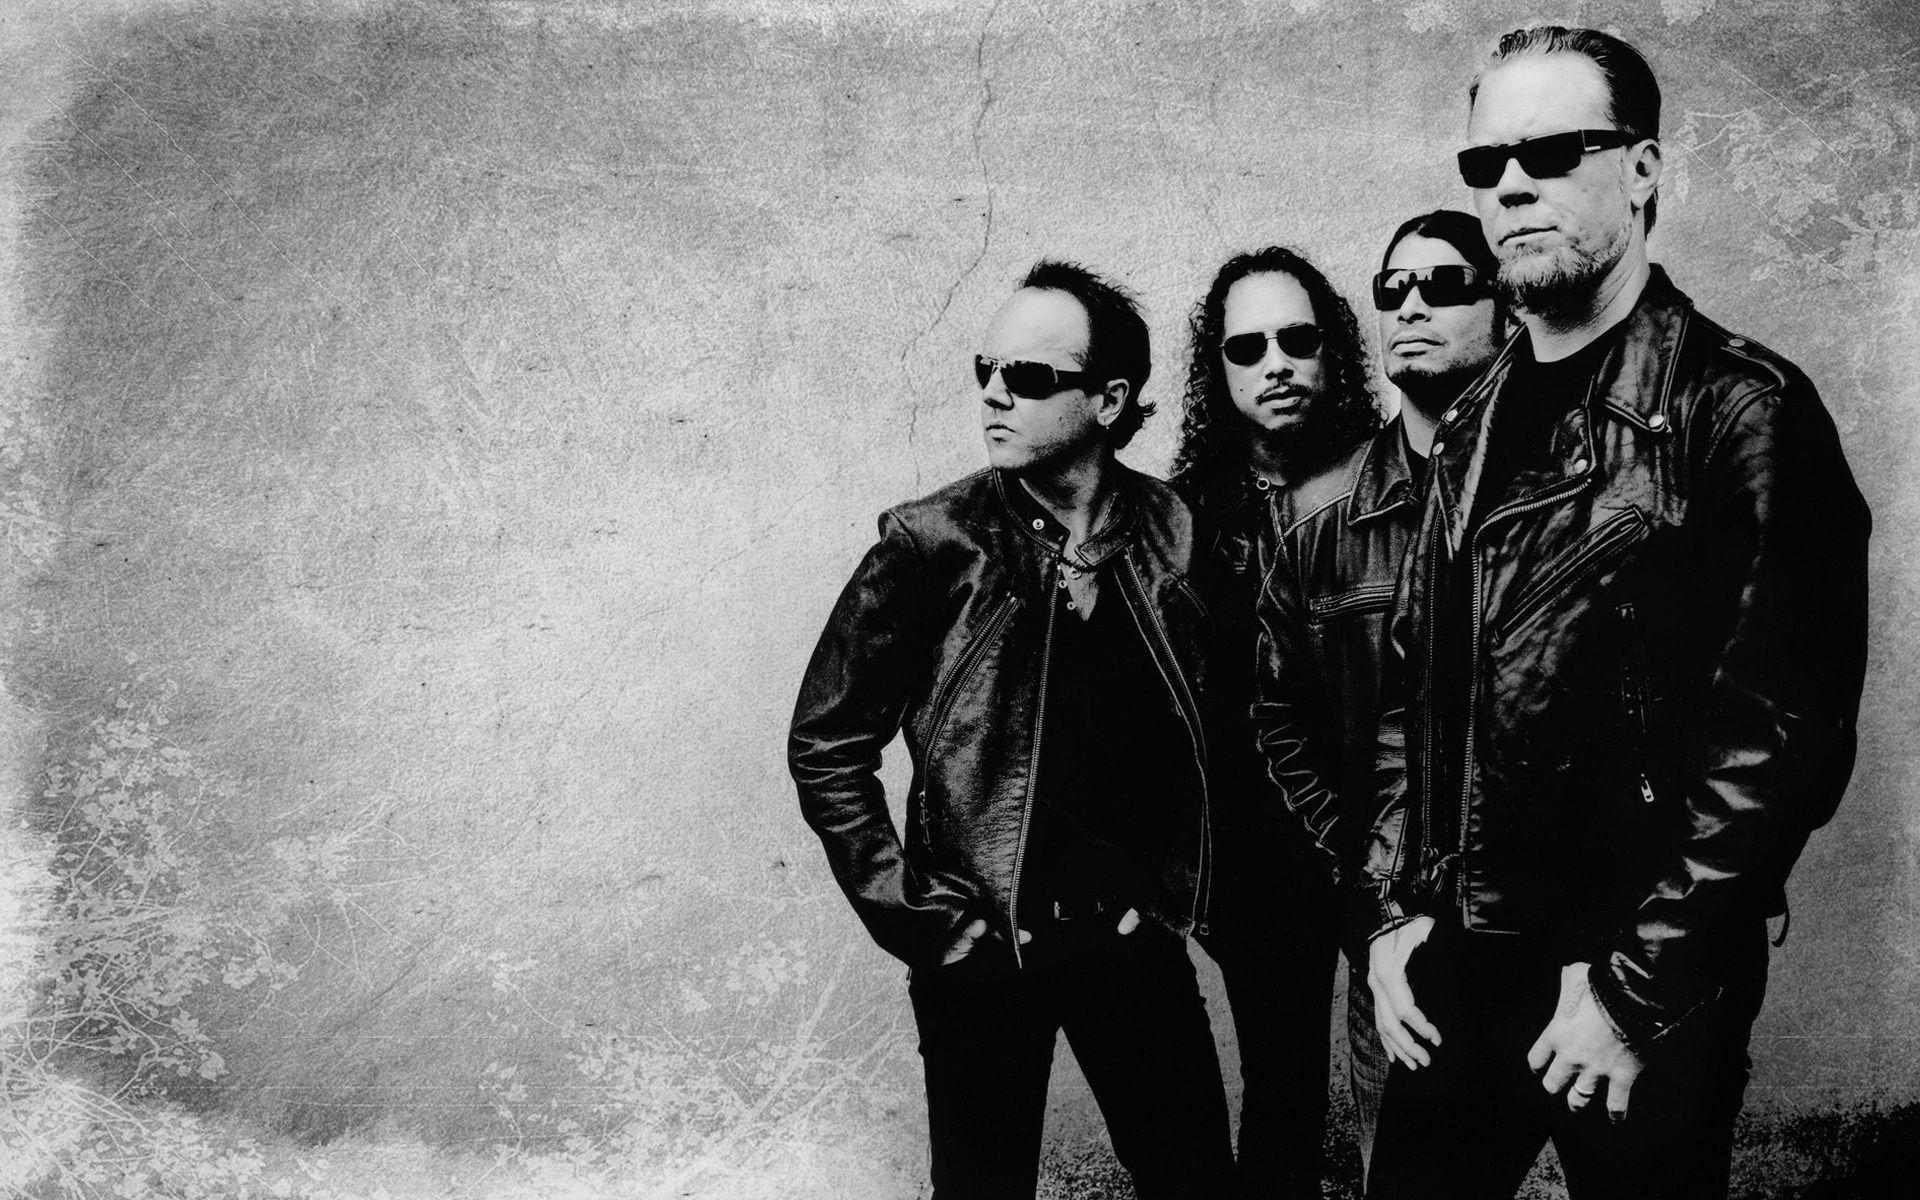 Metallica Wallpapers – Full HD wallpaper search